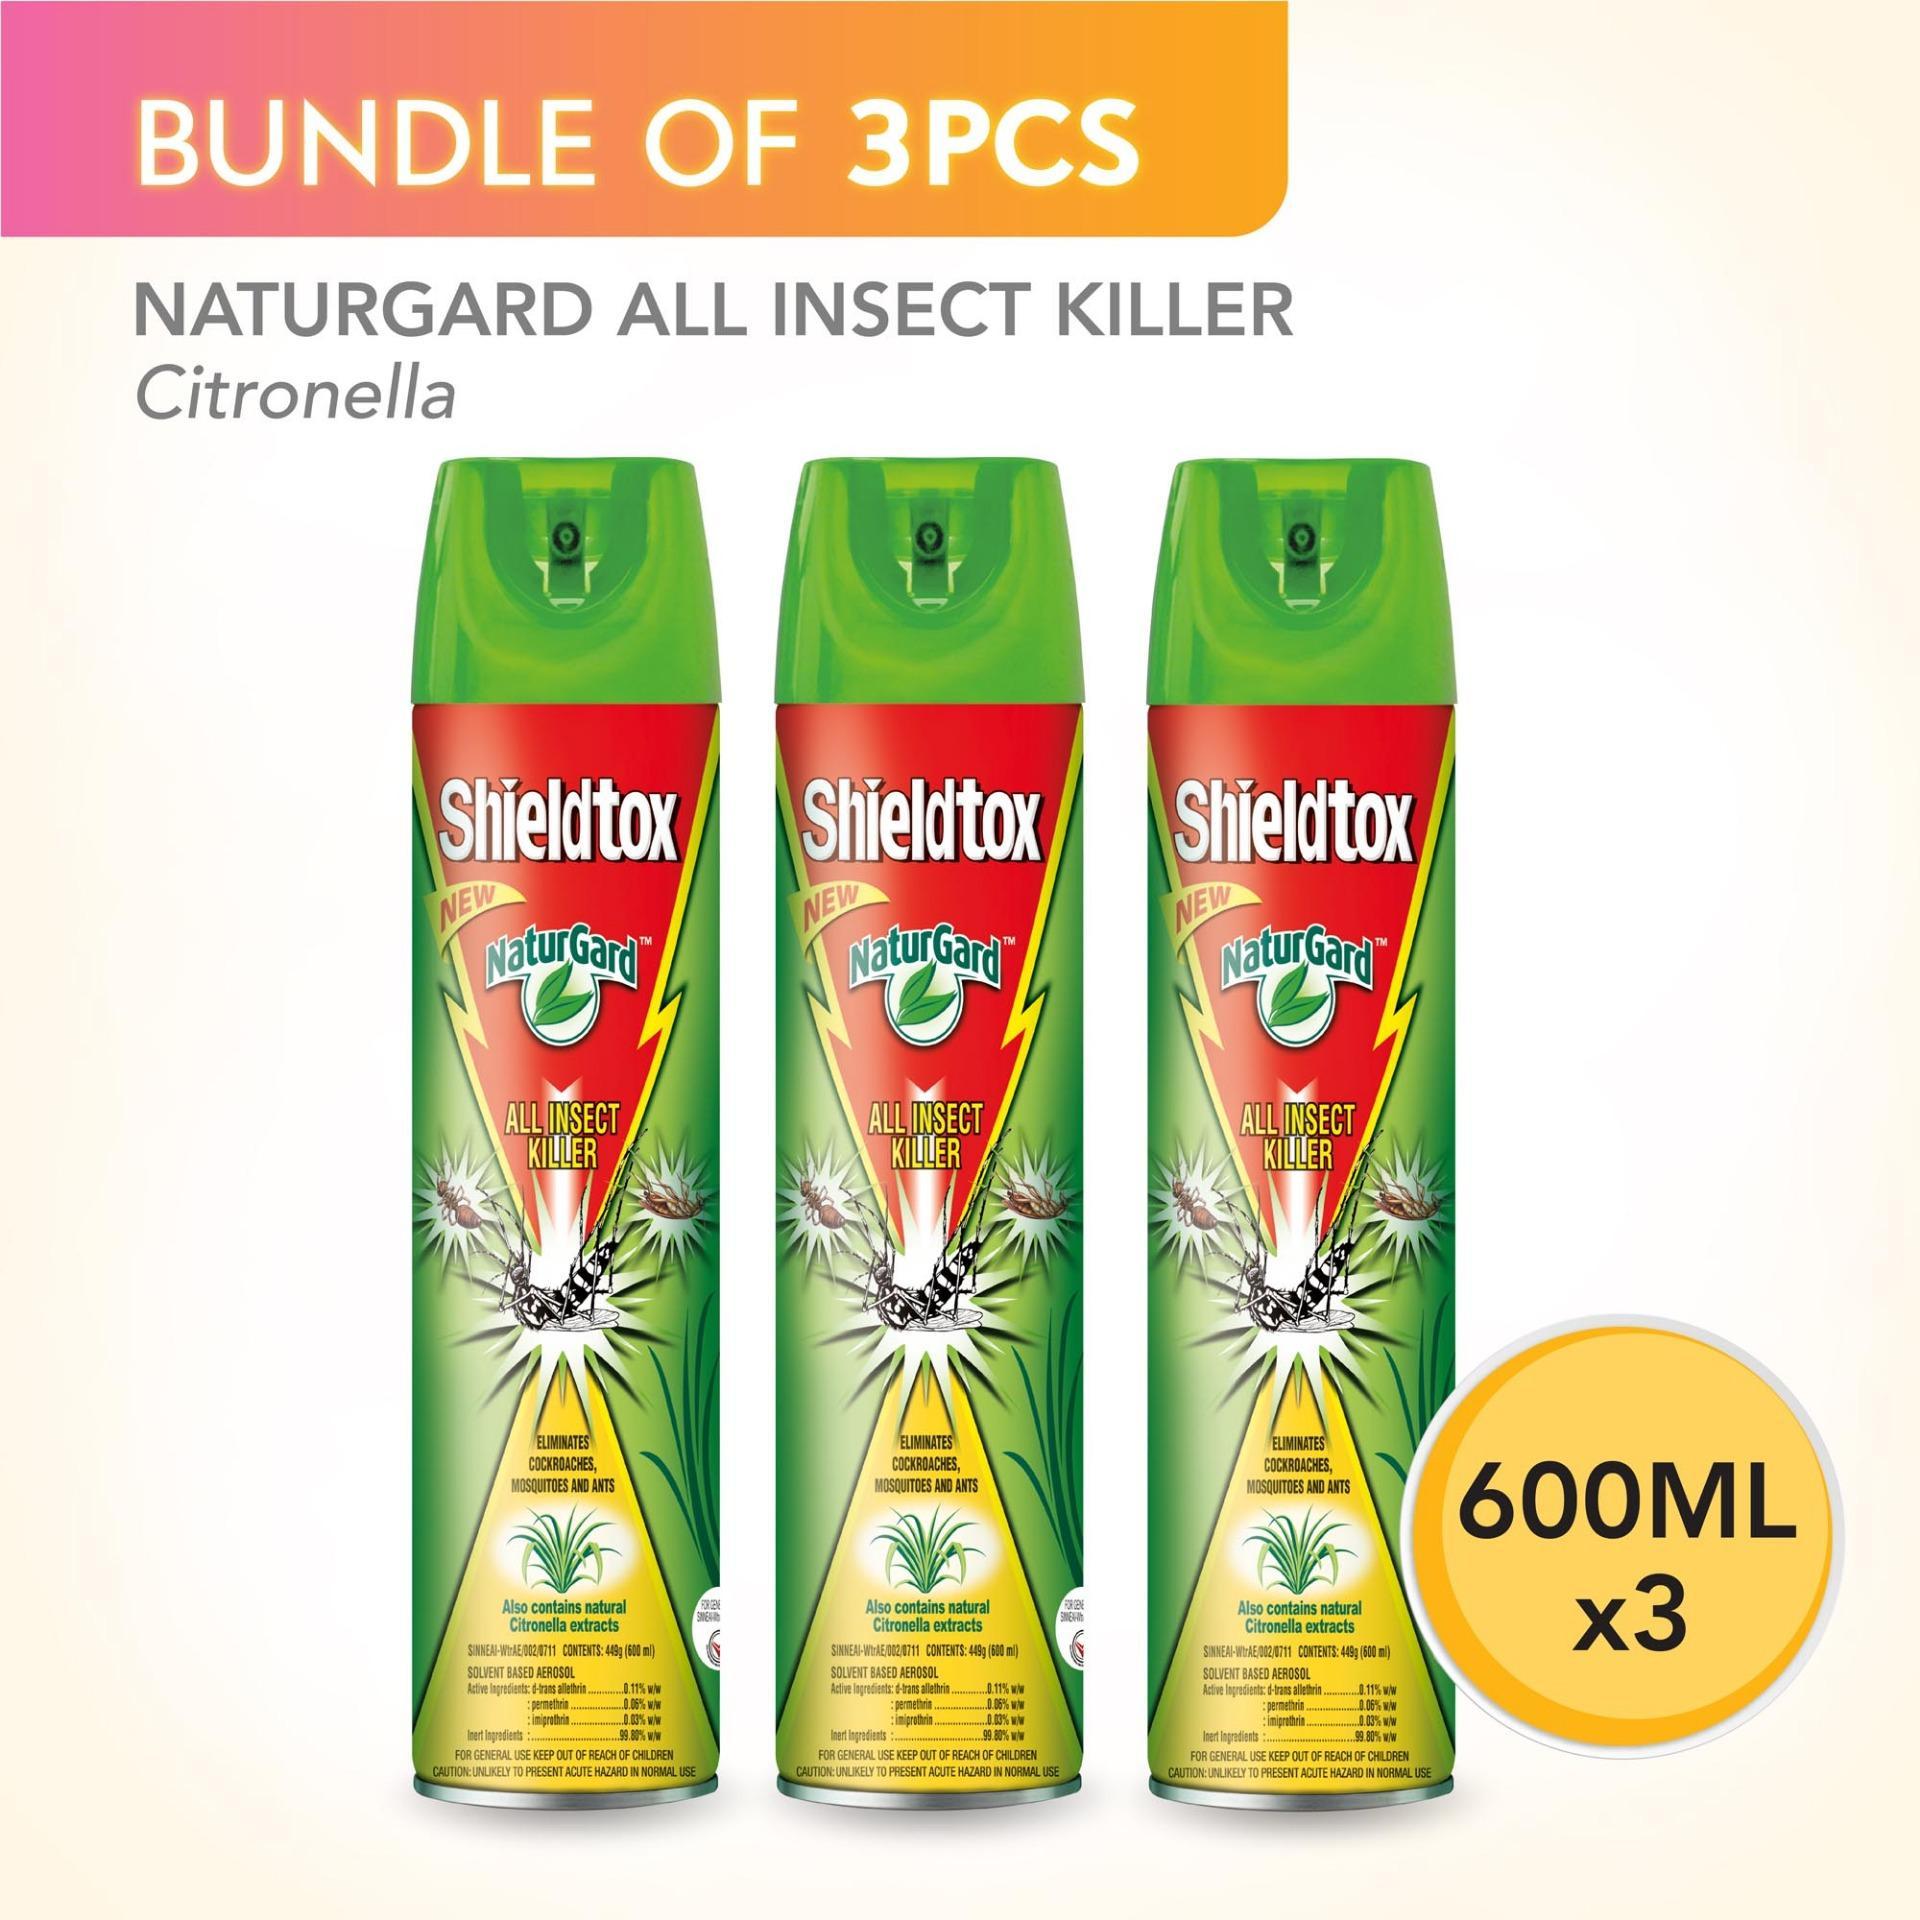 Baygon Multi Insect Killer 300ml X3 Singapone Twin Pack Aerosol Natural Orange 600ml Shieldtox Naturgard All Citronella X 3